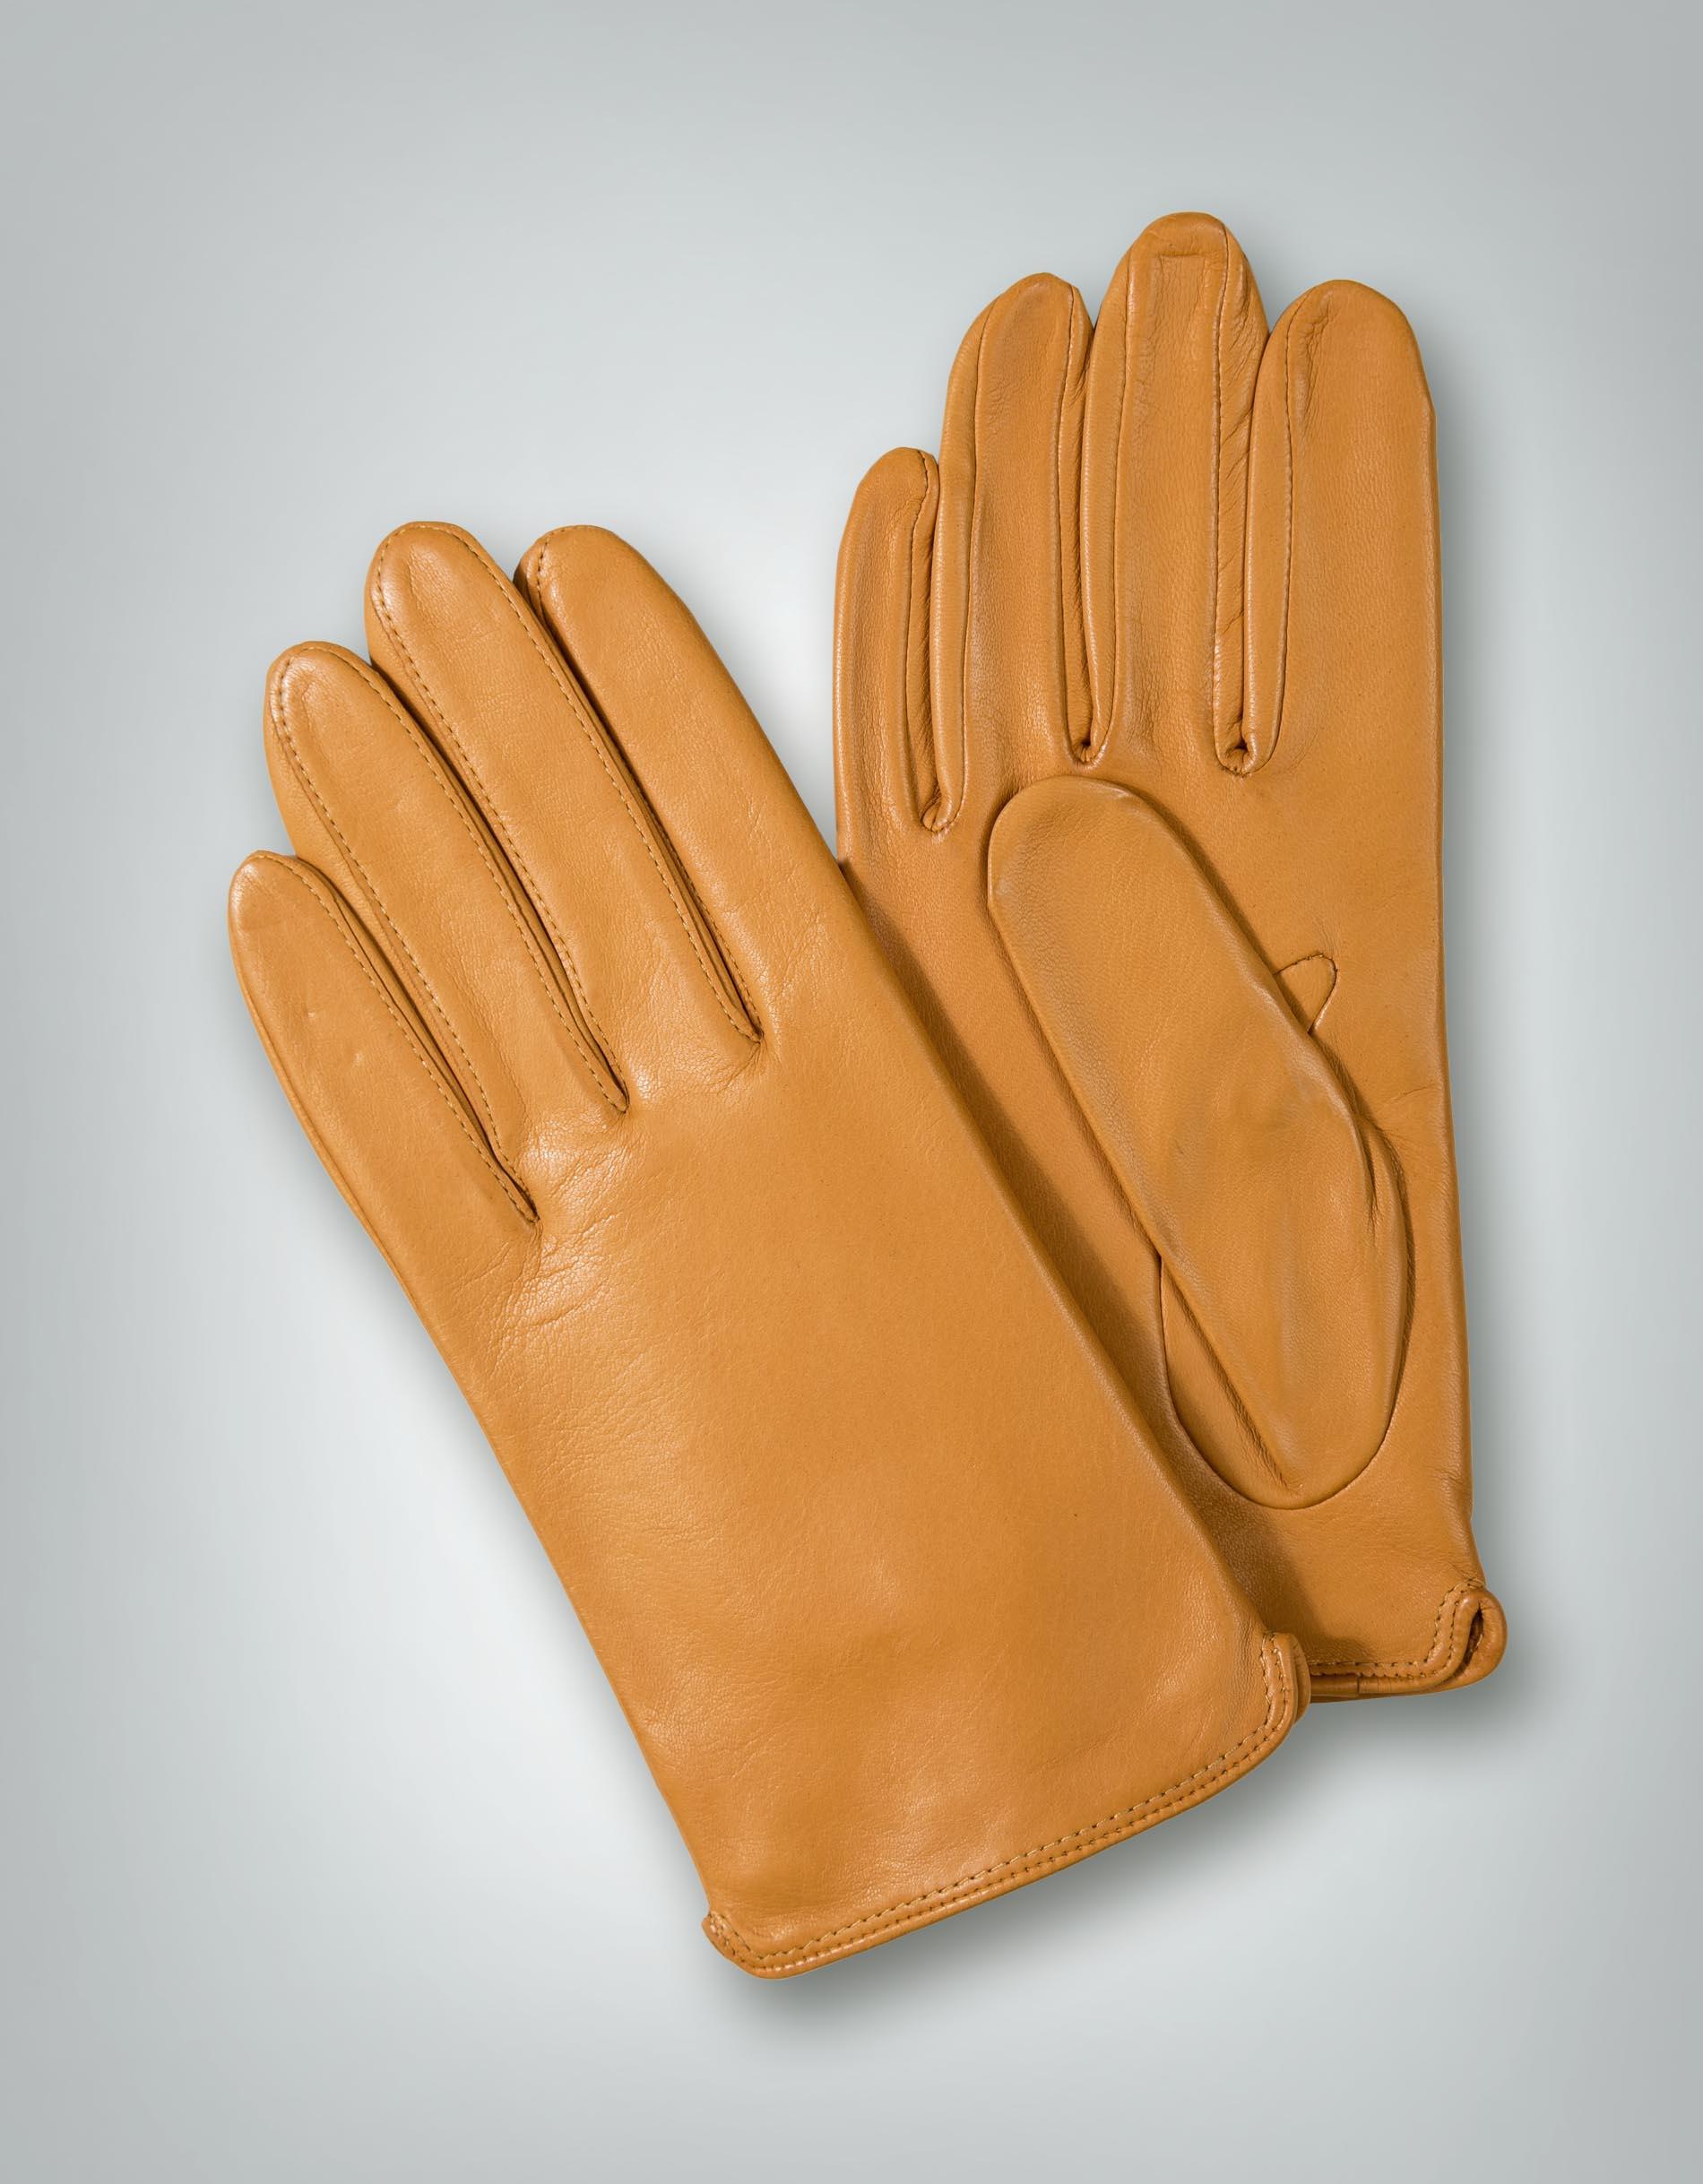 roeckl damen handschuhe aus haarschaf nappaleder empfohlen. Black Bedroom Furniture Sets. Home Design Ideas